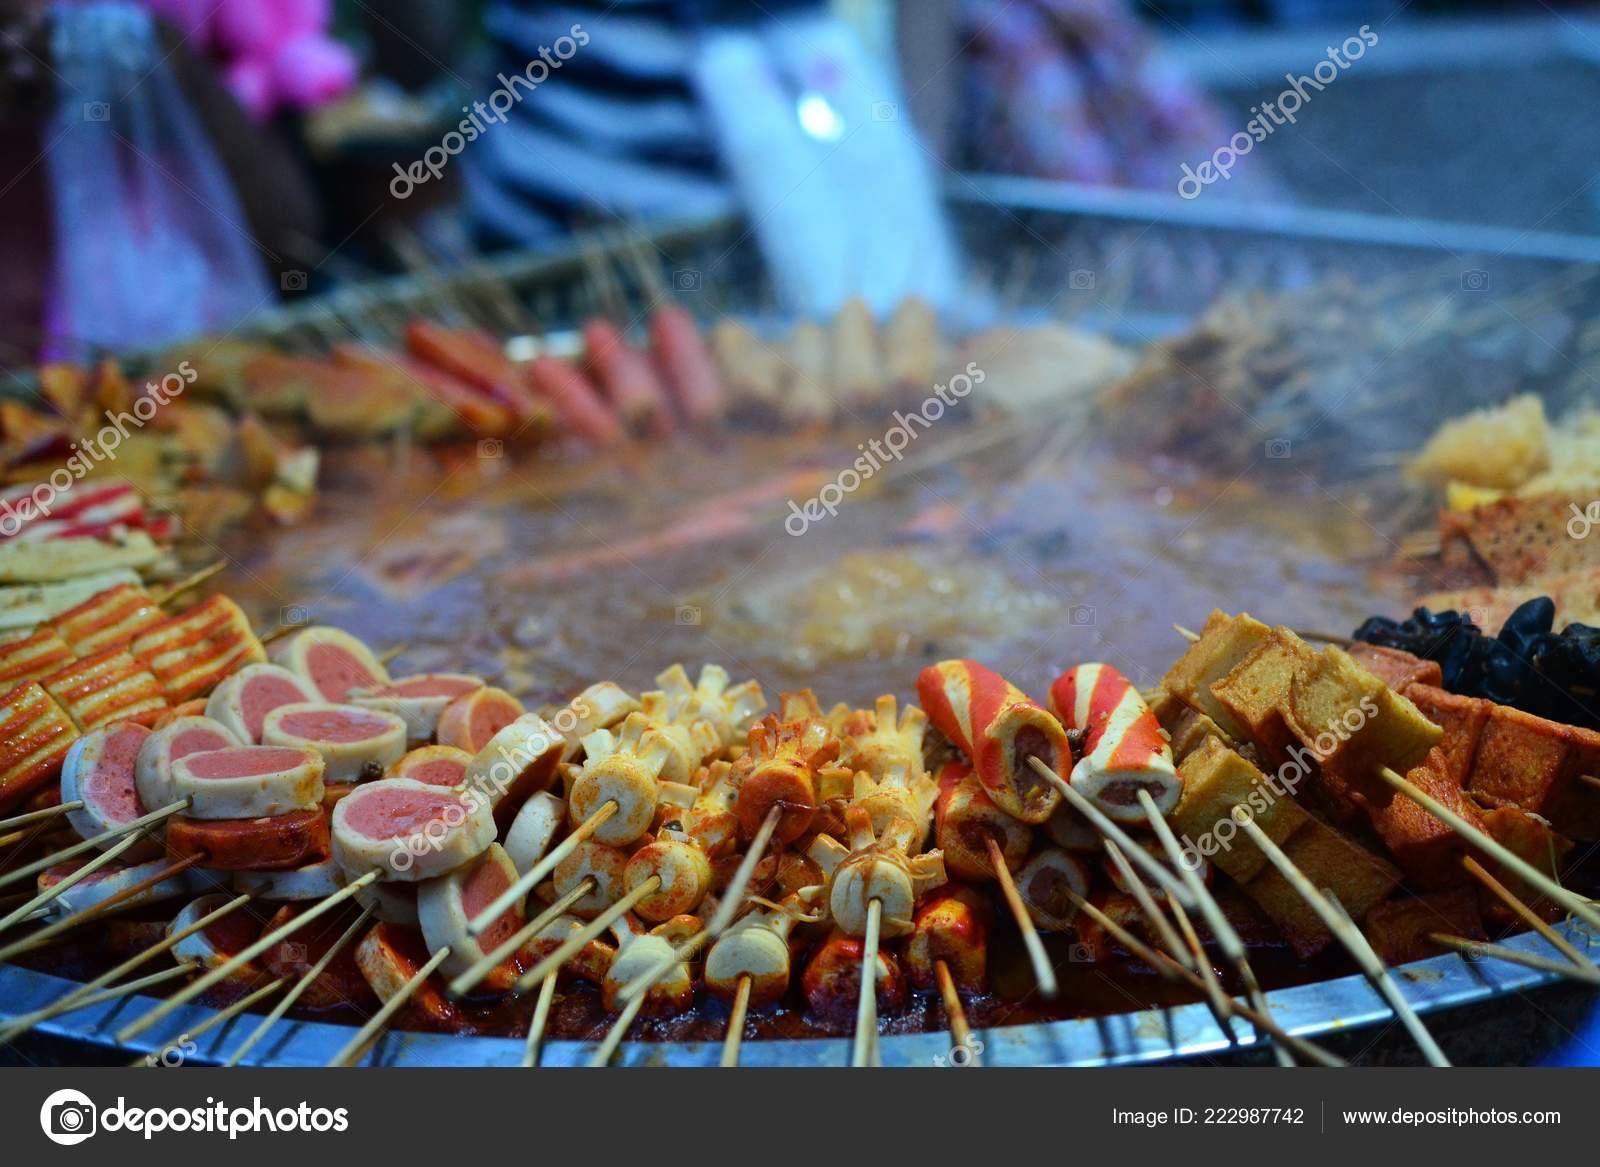 Hotpot skewers, malatang, Chinese food, Xinjiang Uyghur delicacies